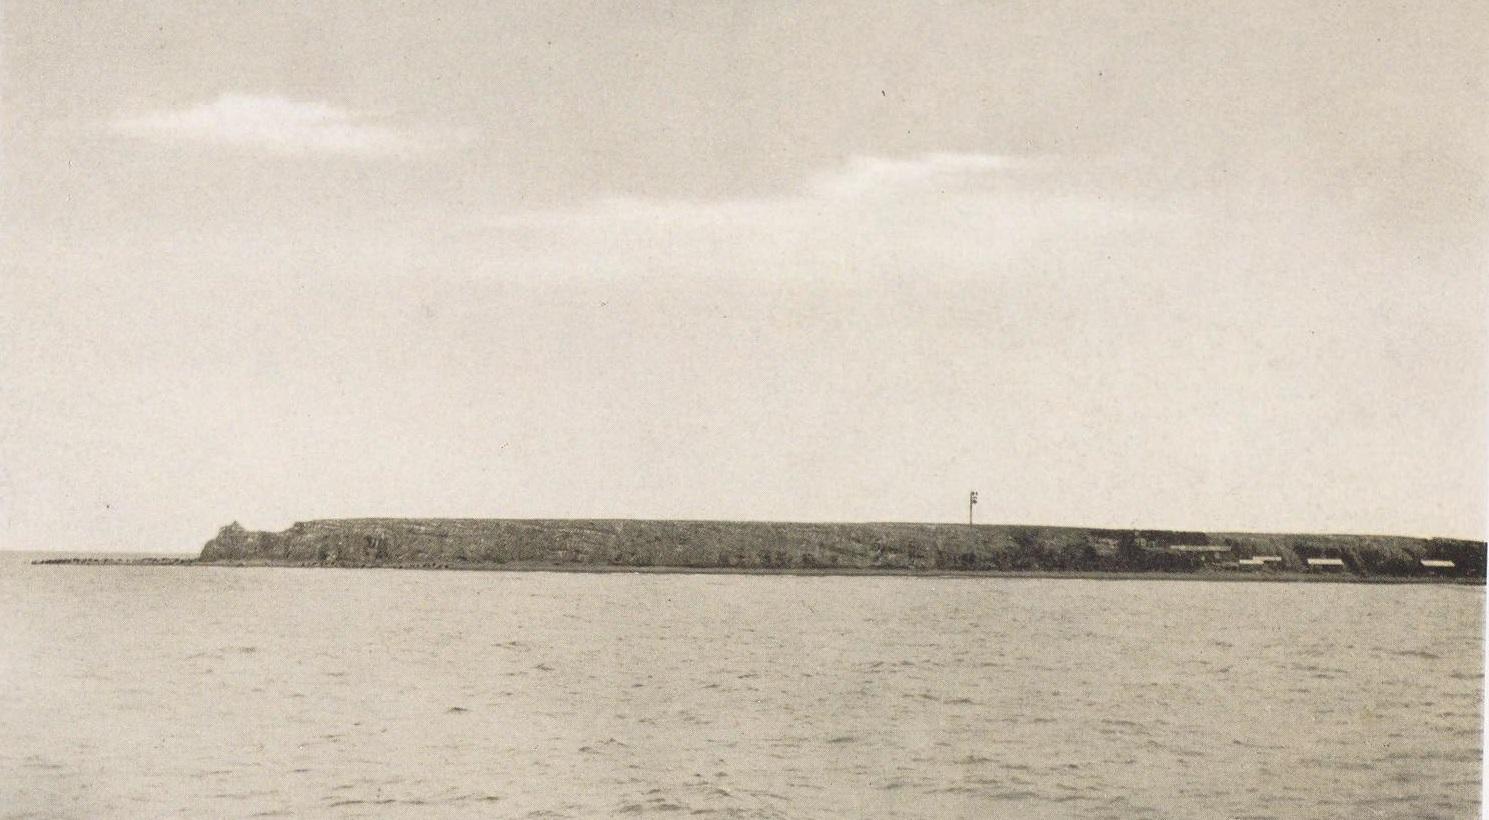 Вид на остров Кaihyo island (Остров Тюлений)